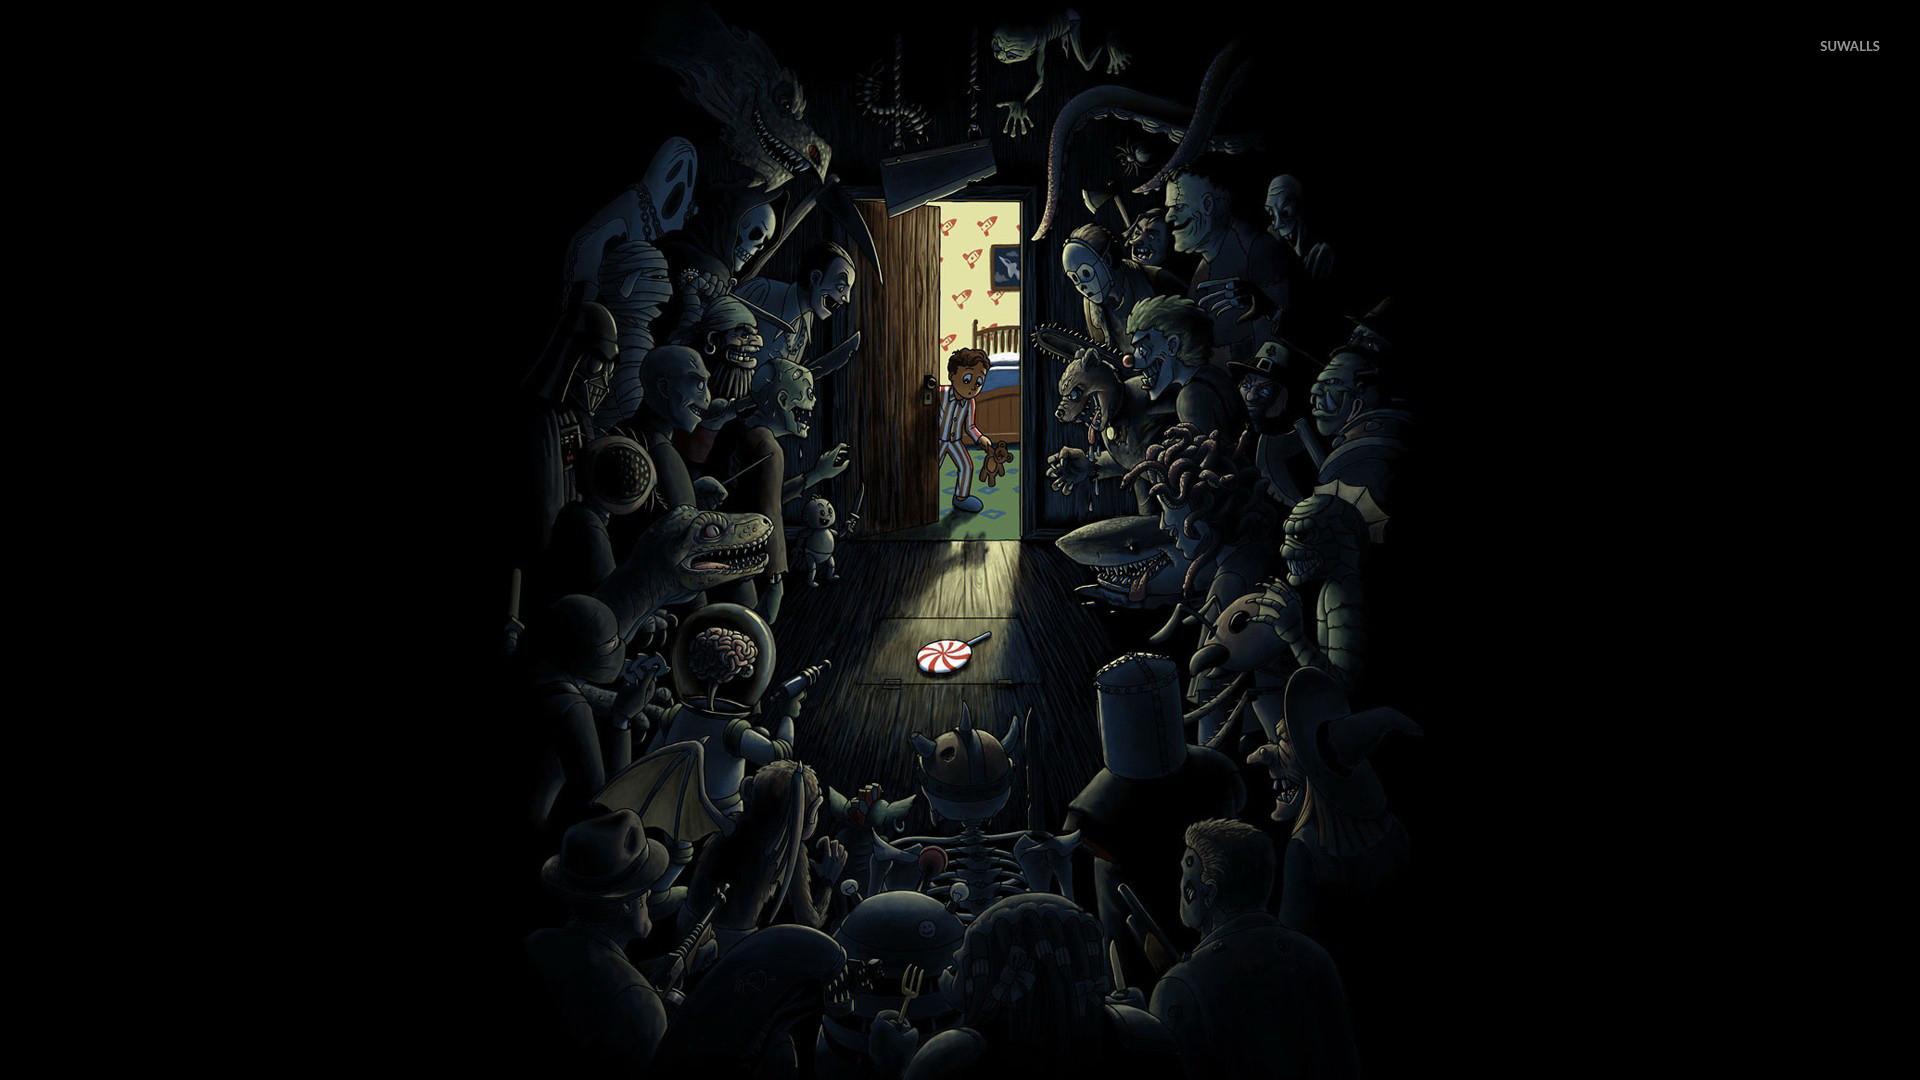 Monsters in the closet wallpaper jpg